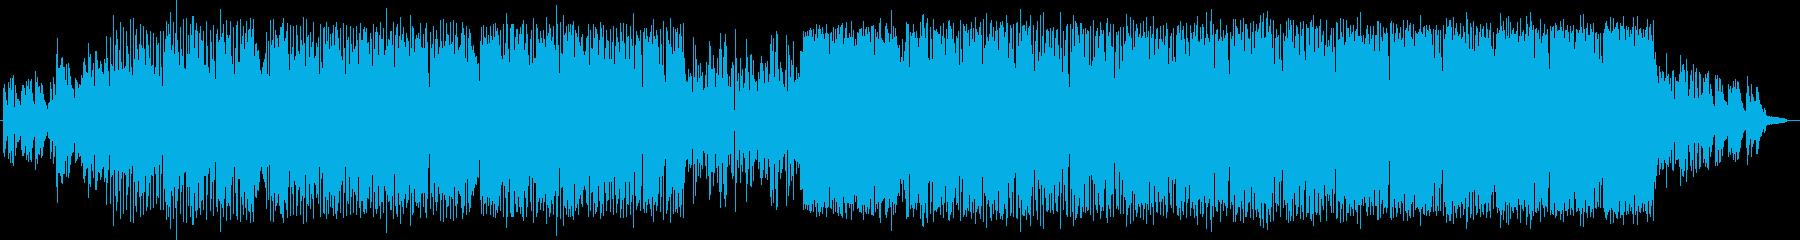 House-Popの再生済みの波形